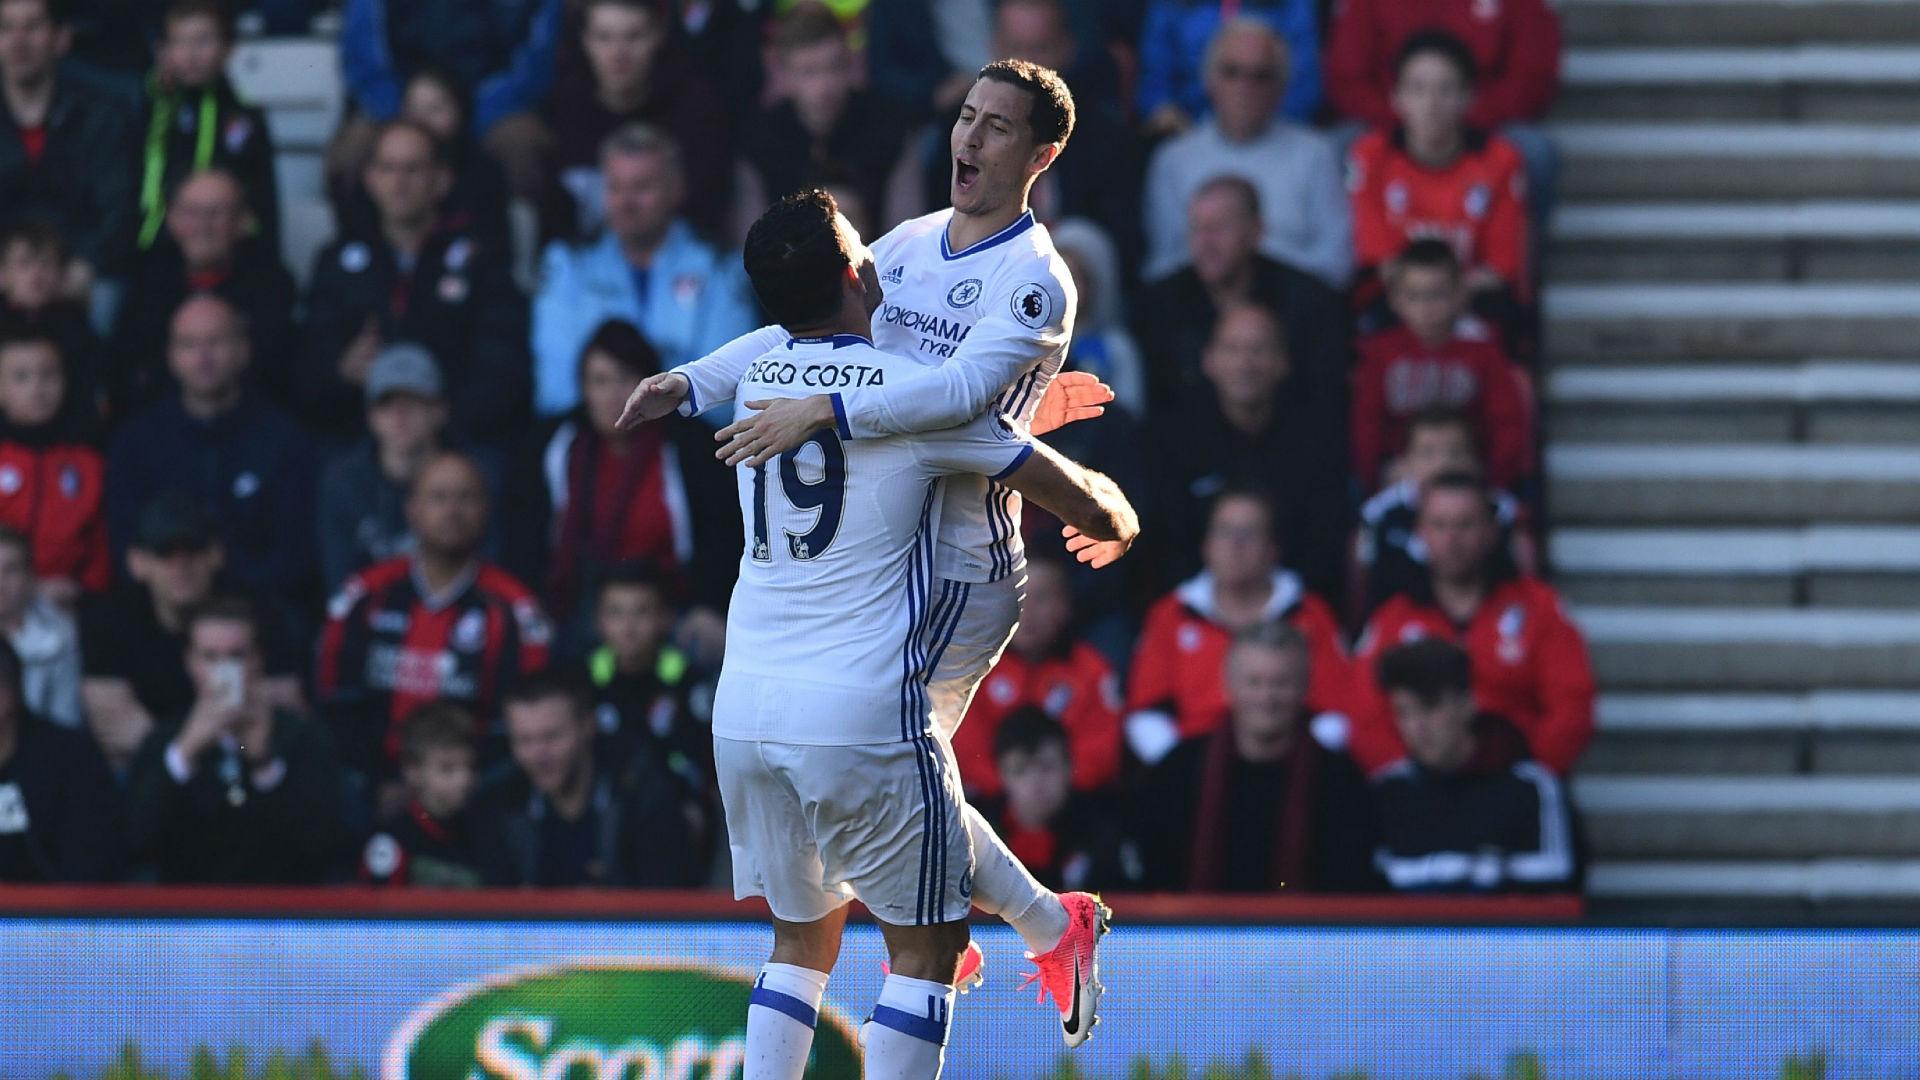 Hazard and Costa